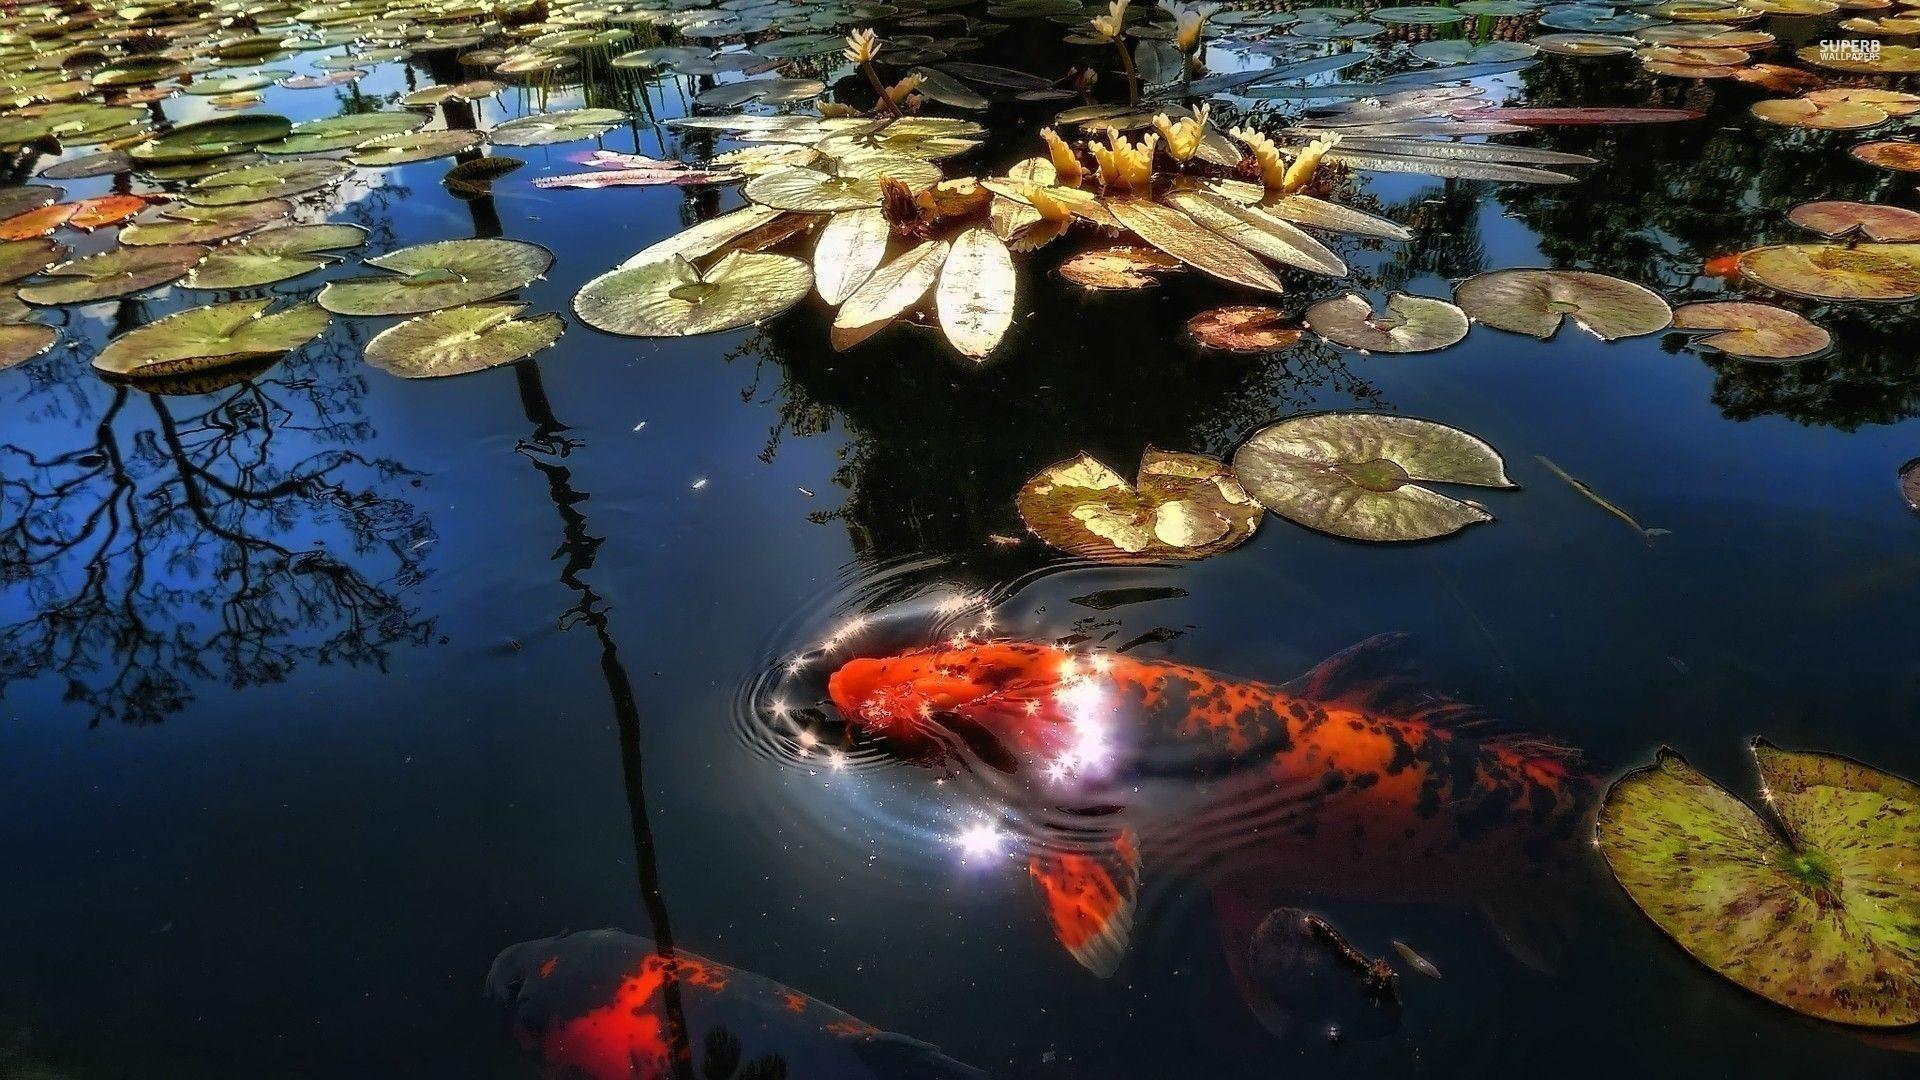 Koi Pond Wallpaper 59 Pictures